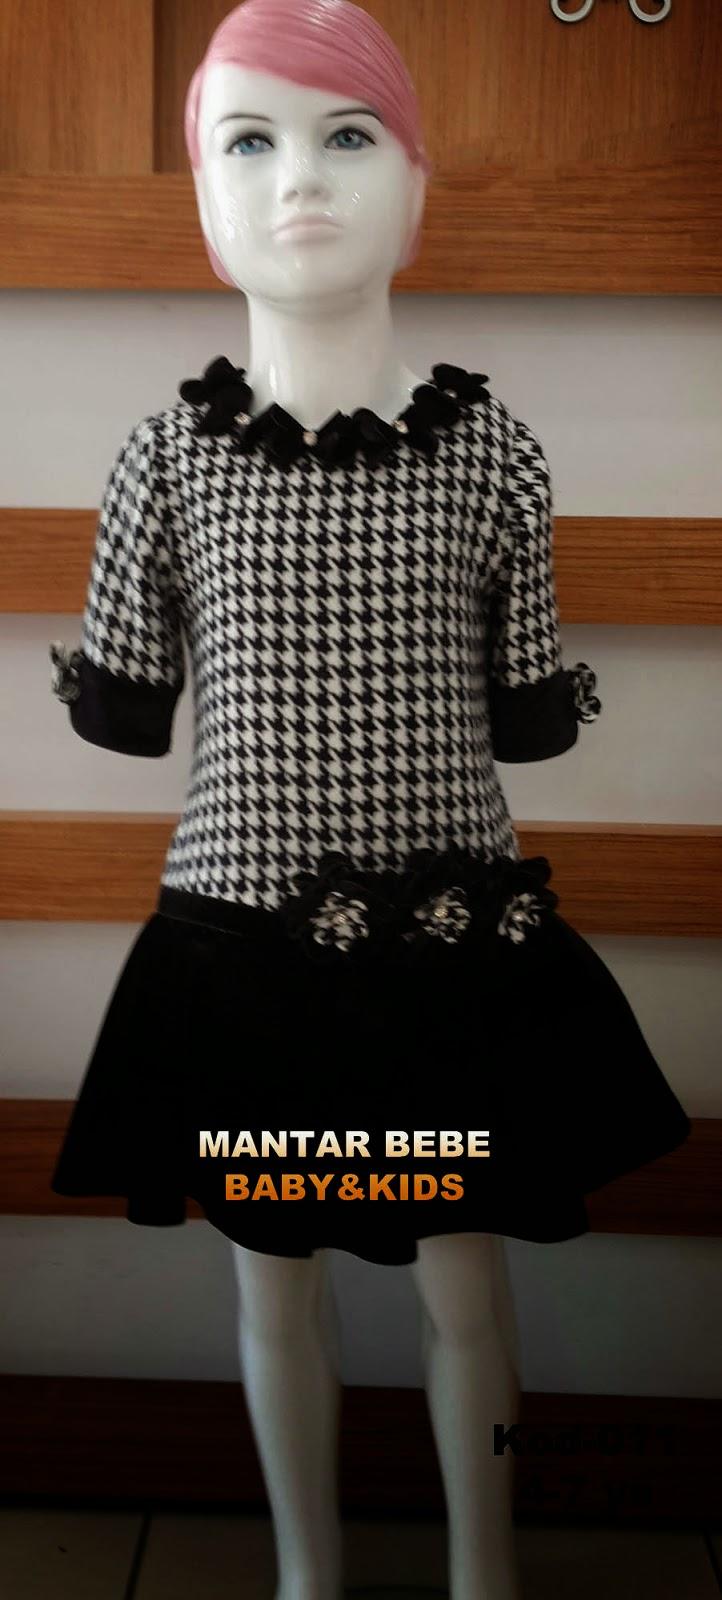 MANTAR BEBE ÇOCUK GİYİM - KOD011